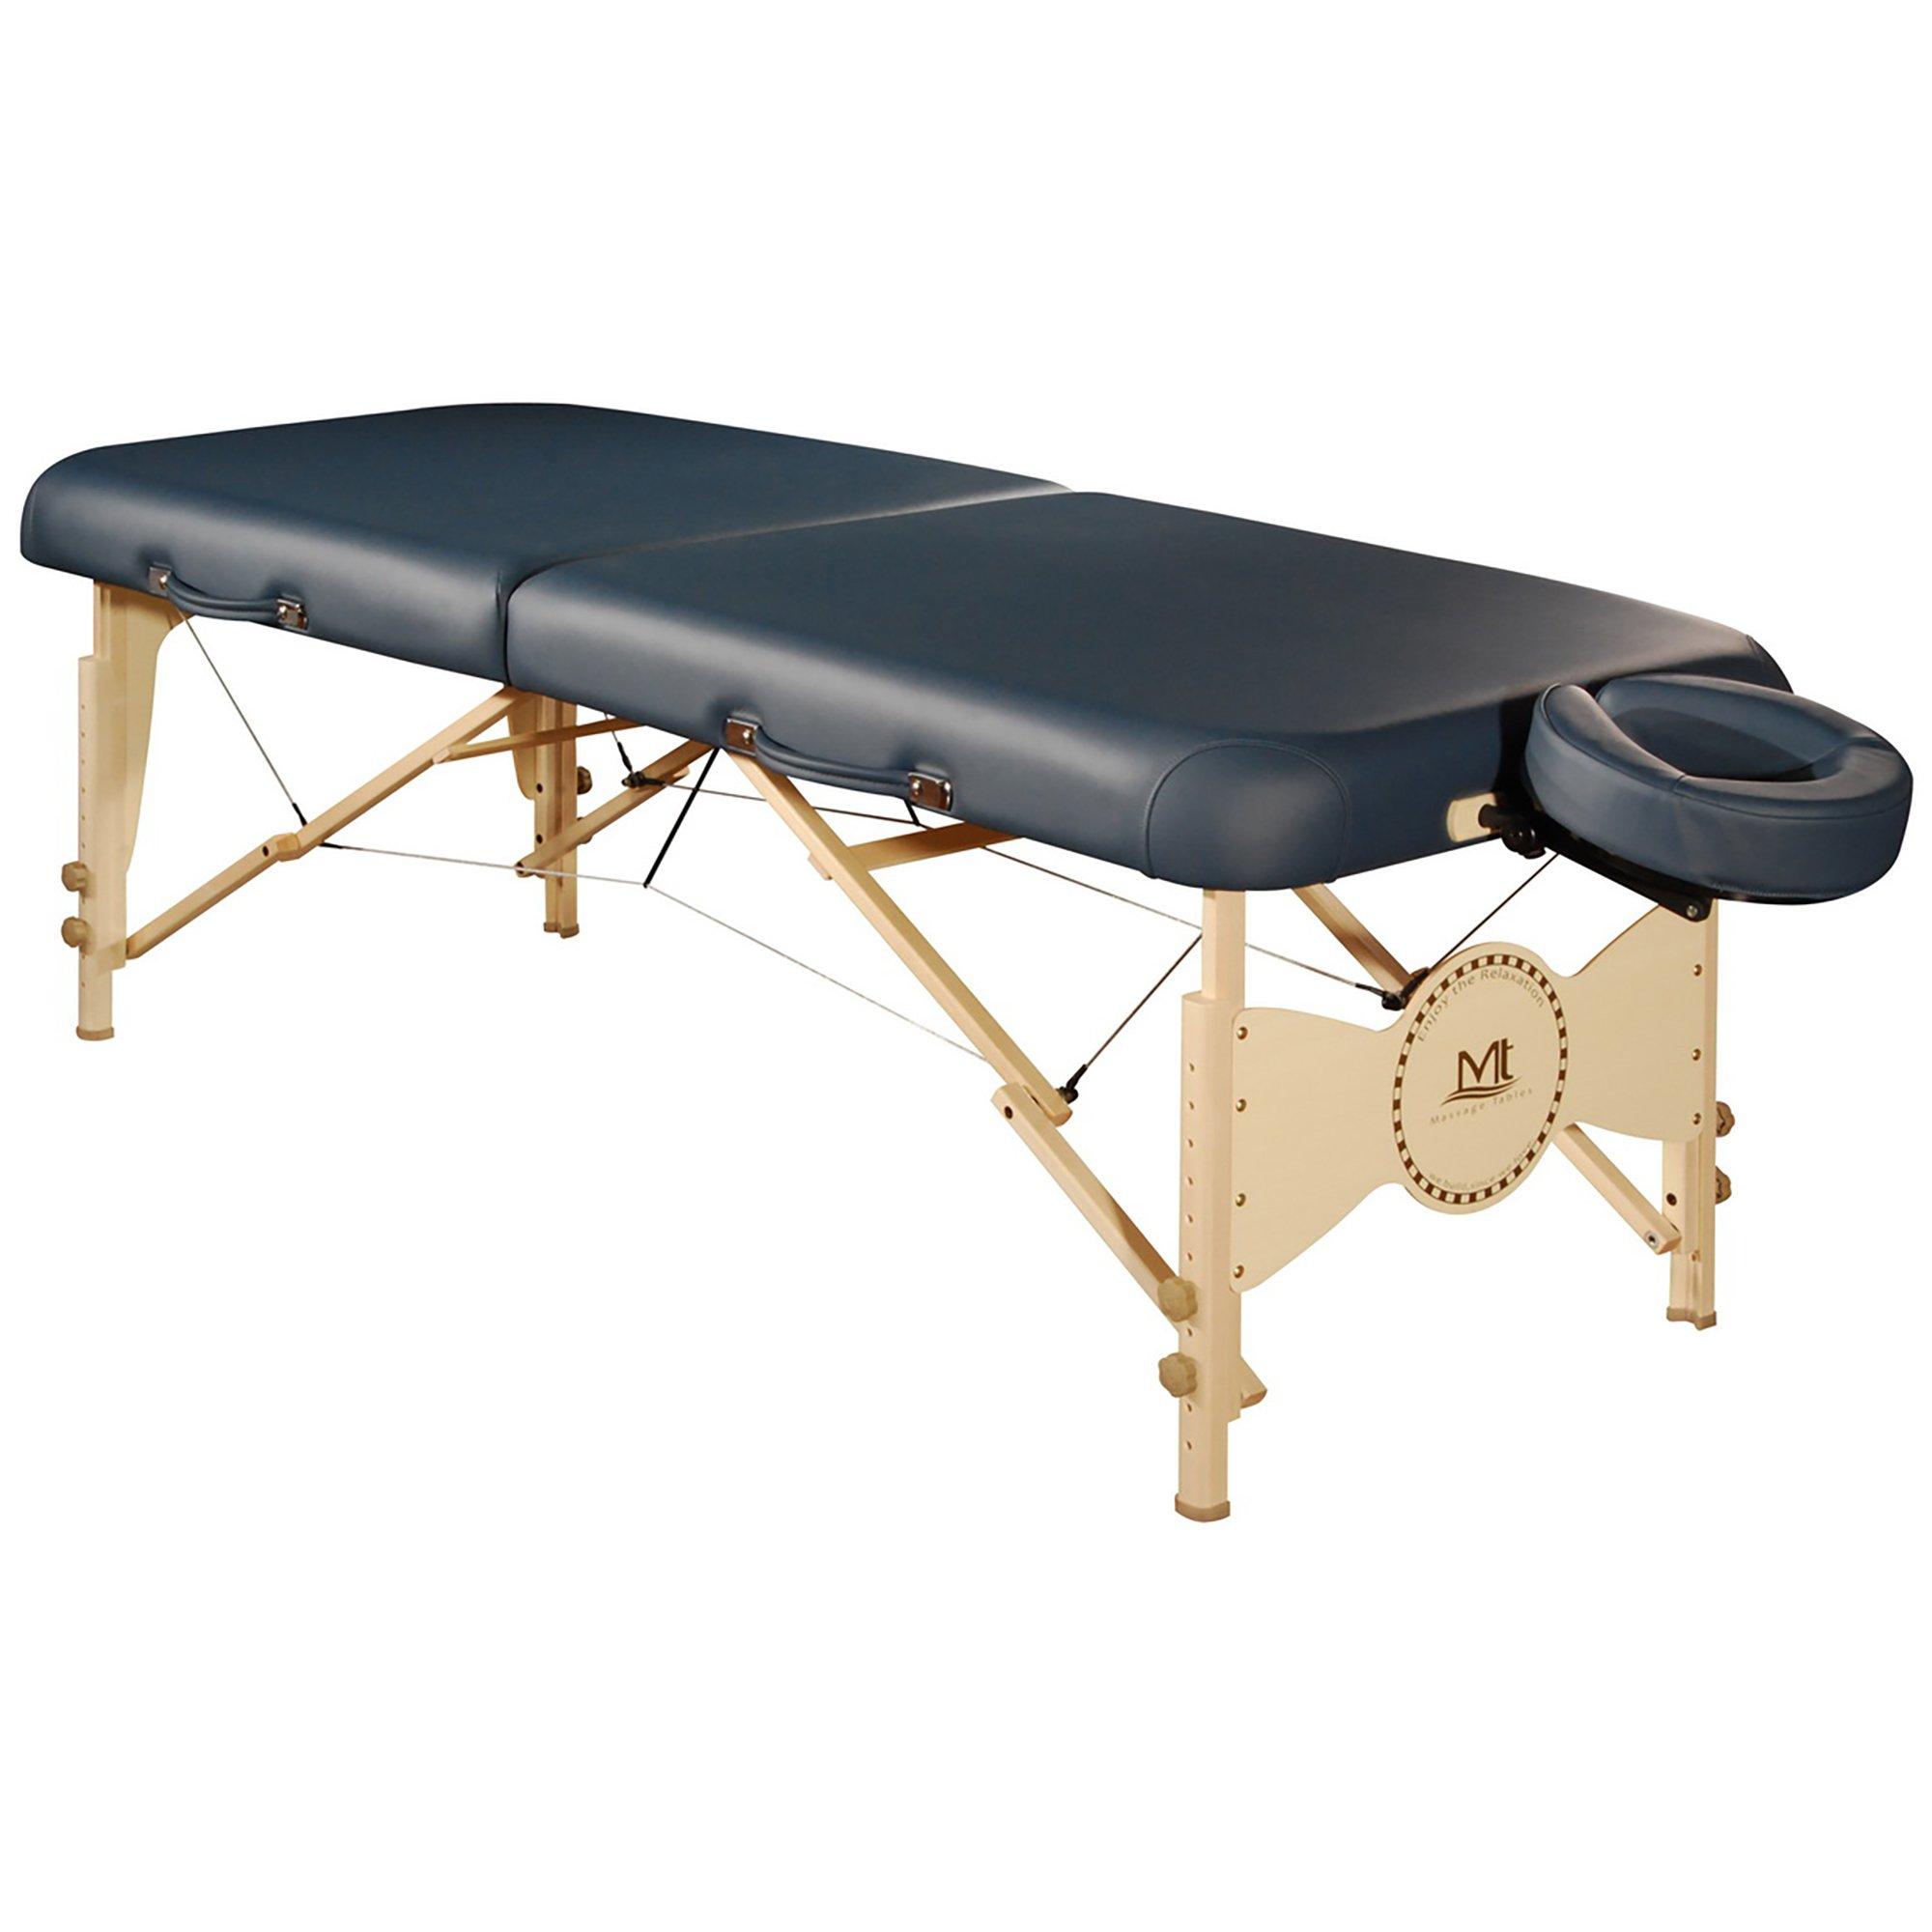 Mt Massage Midas-Plus 30'' Professional Portable Massage Table Package with Reiki Panel(Agate Blue)